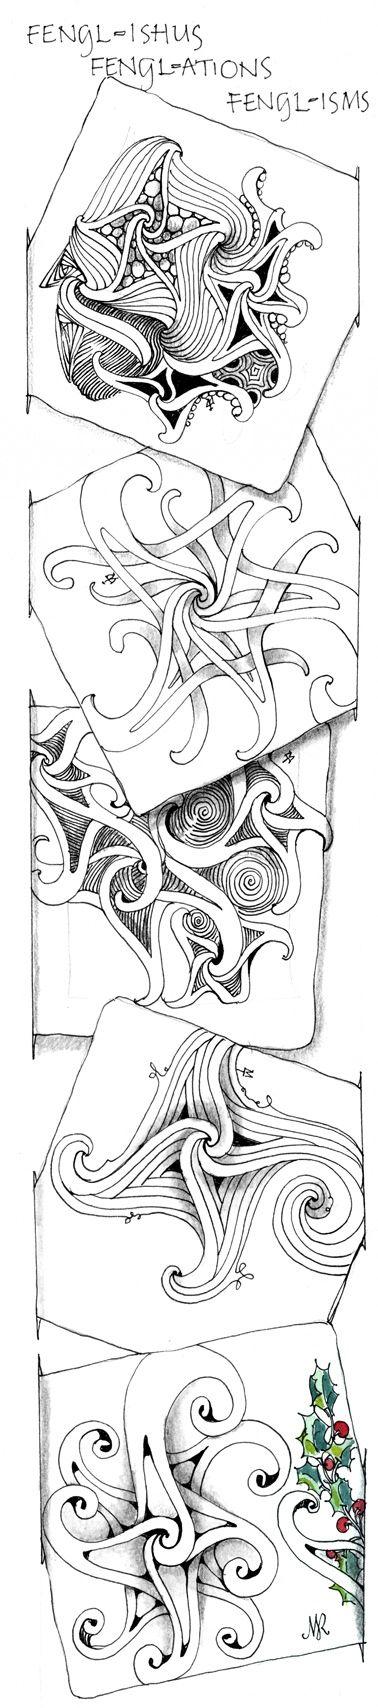 """Fengl-ishus"" | ""Fengl-ations"" | ""Fengl-isms"" newest tangles from Zentangle: Art Zentangles, Fengle Zentangles, Drawing Zentangles, Art Inspiration, Fengle B Zentangles, Zentangle Doodle, Zentangle Pattern, Doodles Zentangles"